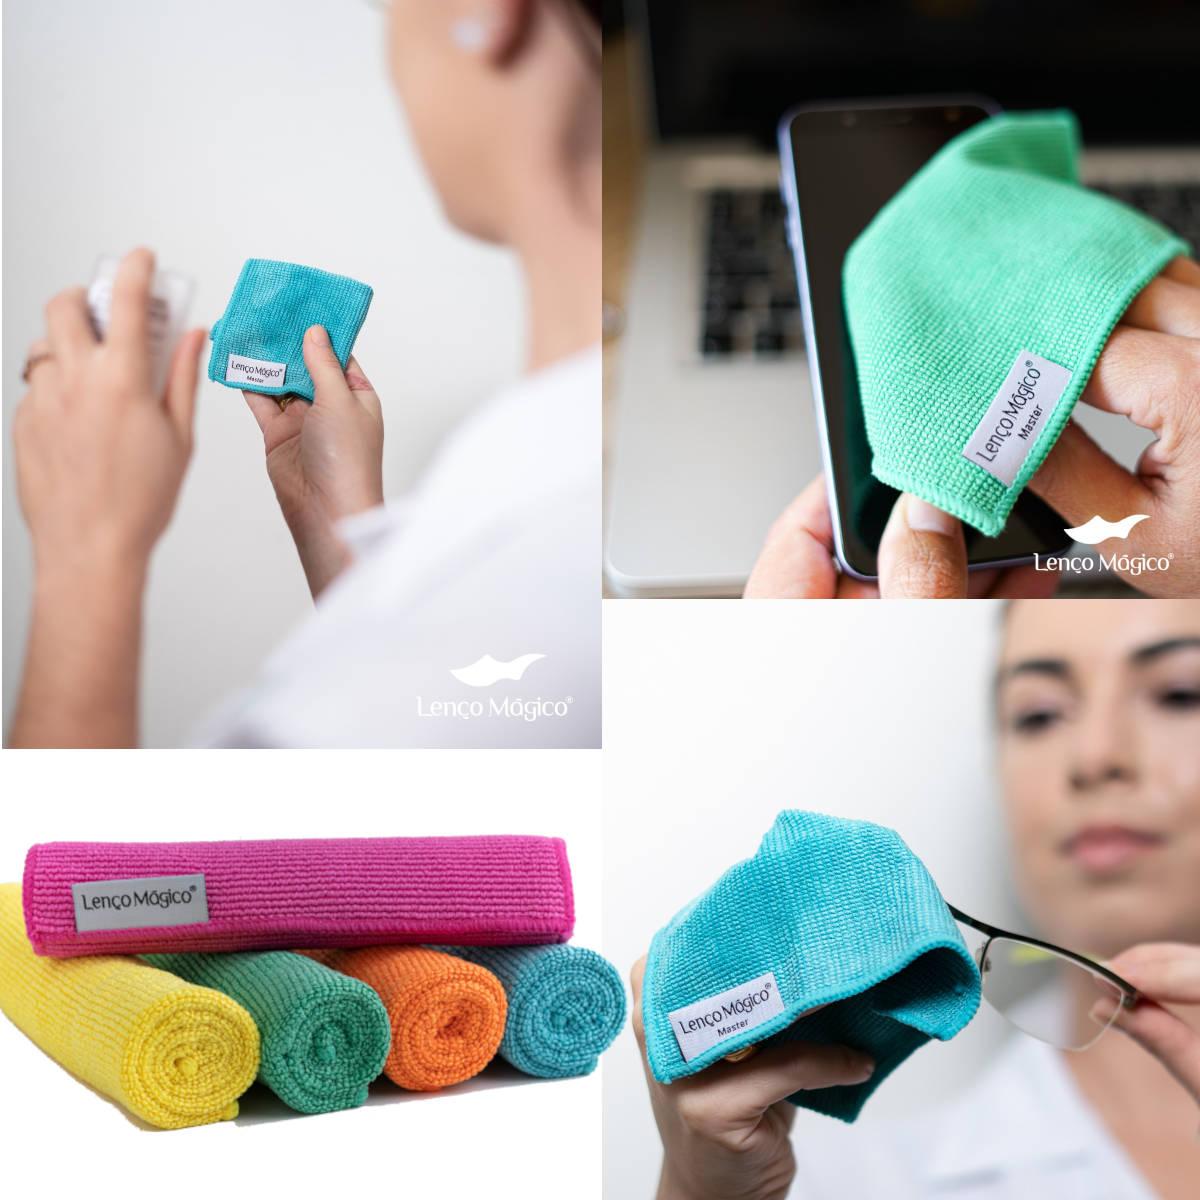 Kit 2 limpa lentes slim + 2 Lenço mágico master